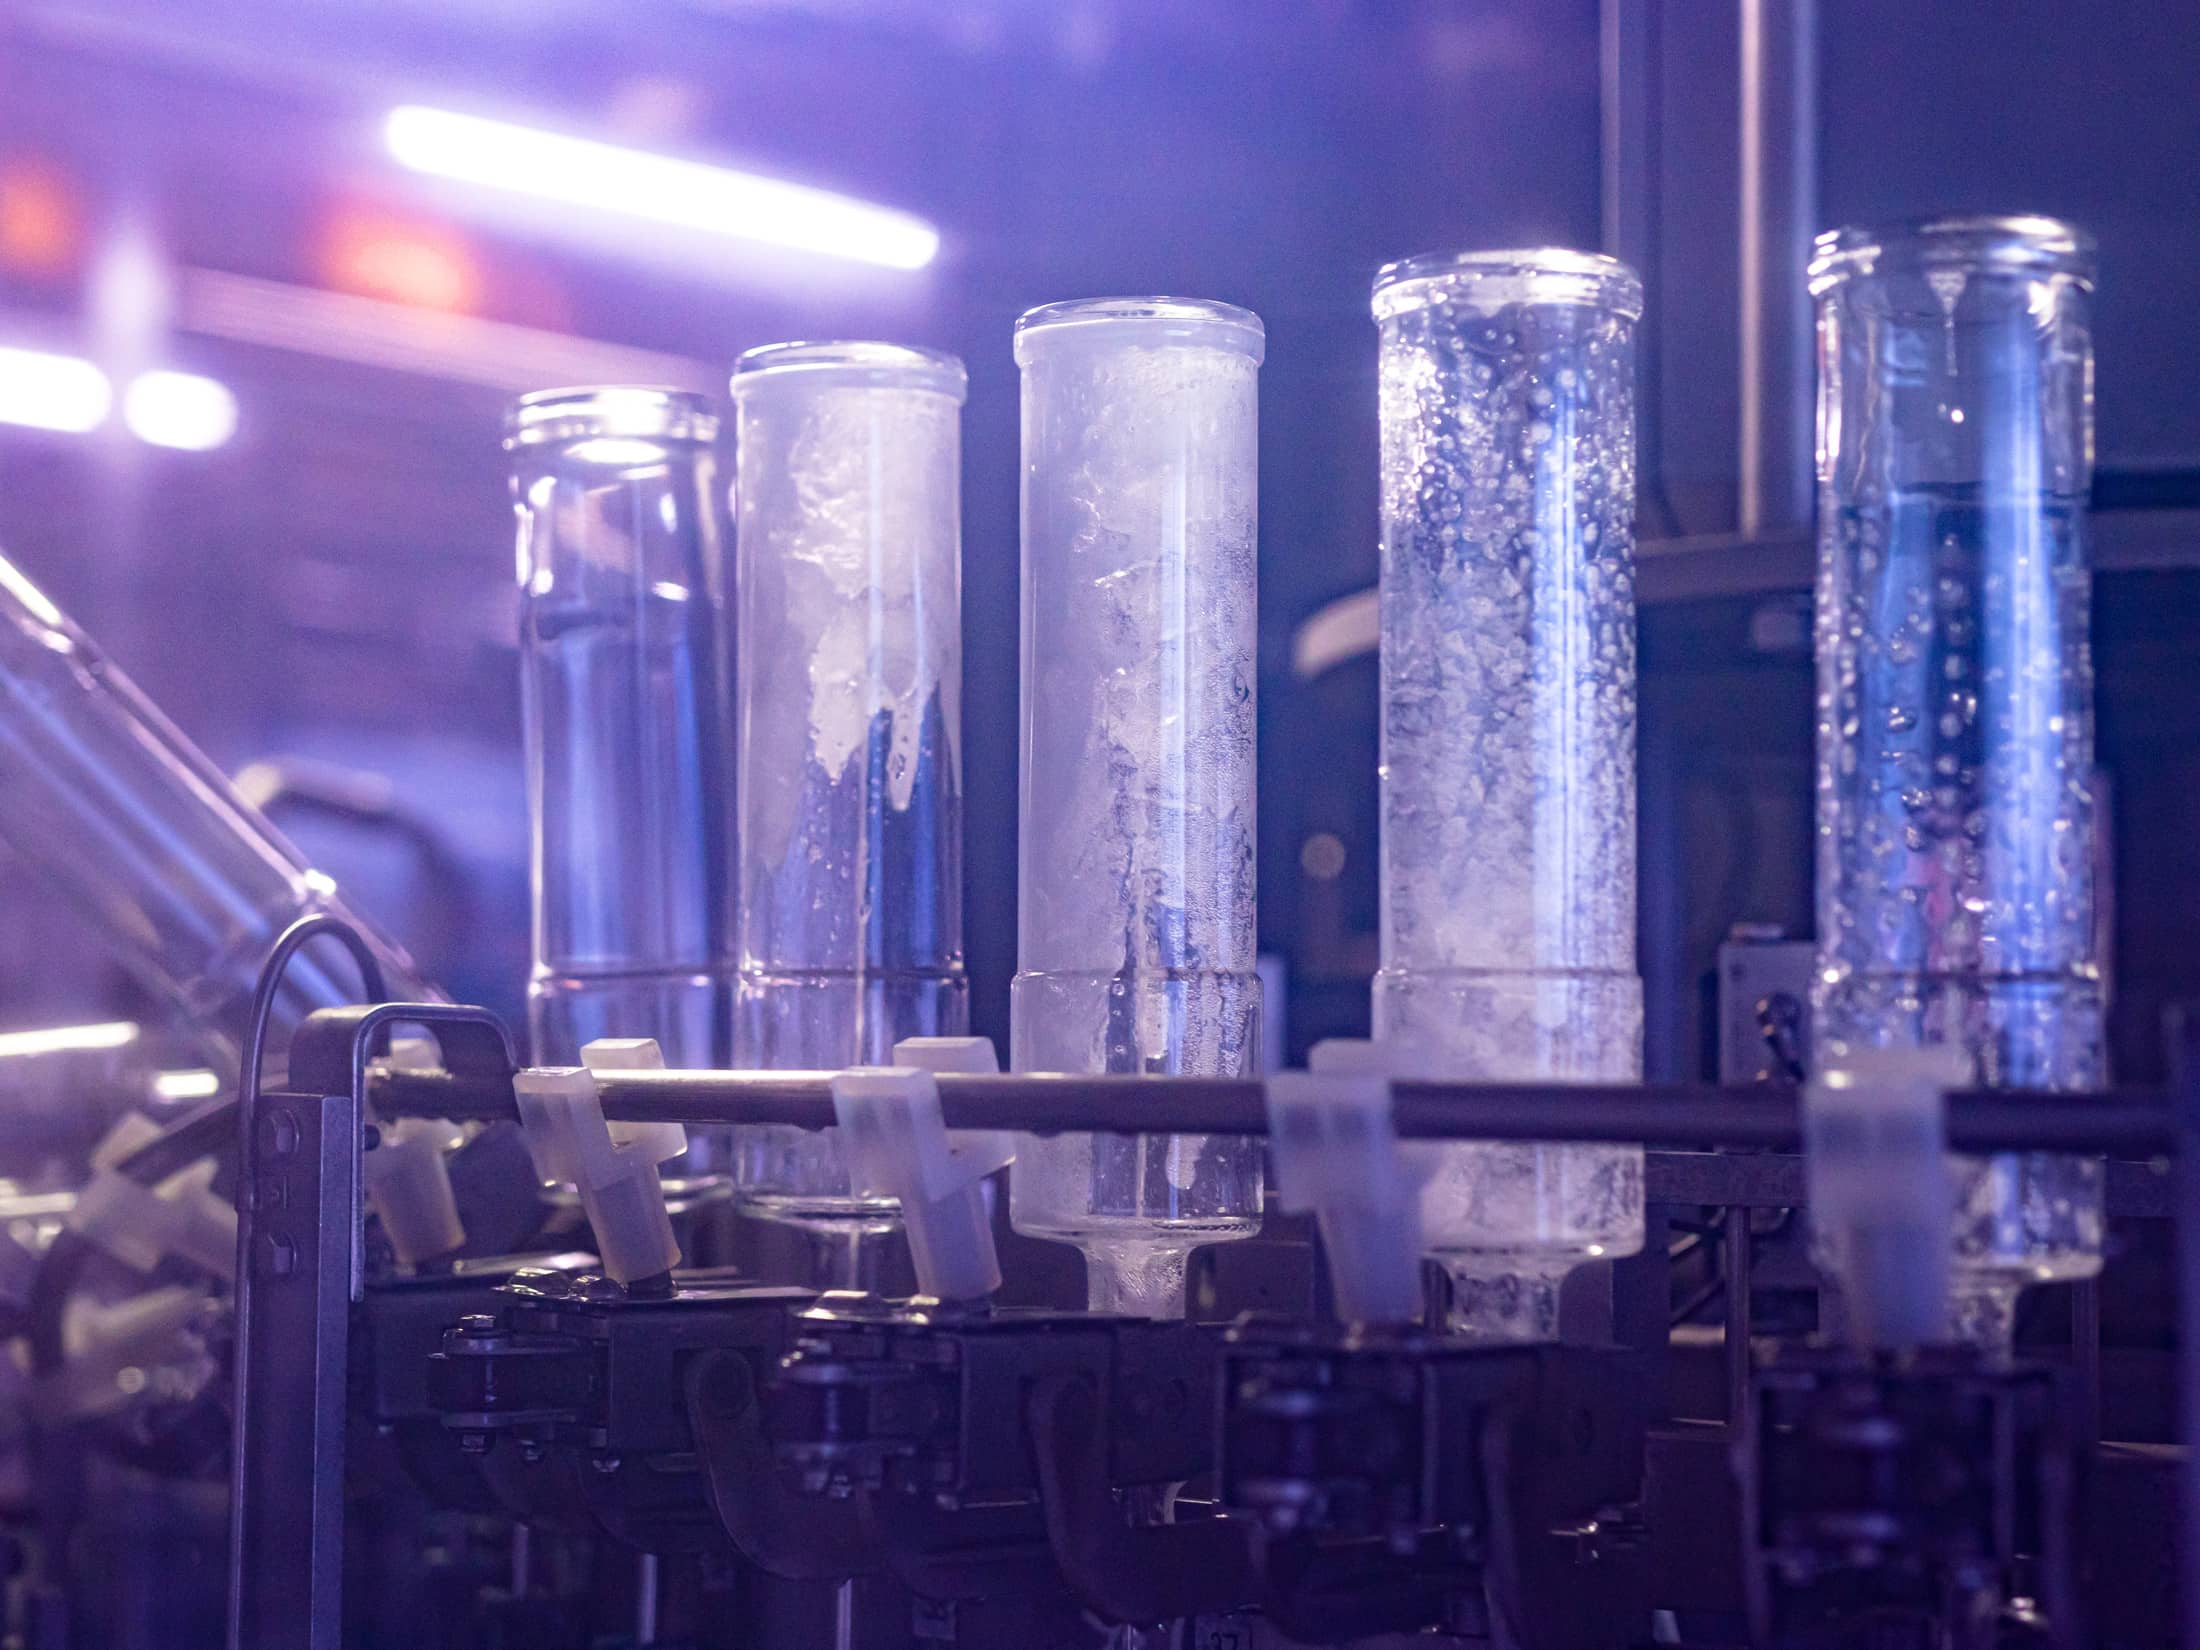 Our vodka distillation process makes the taste of EFFEN Vodka special.